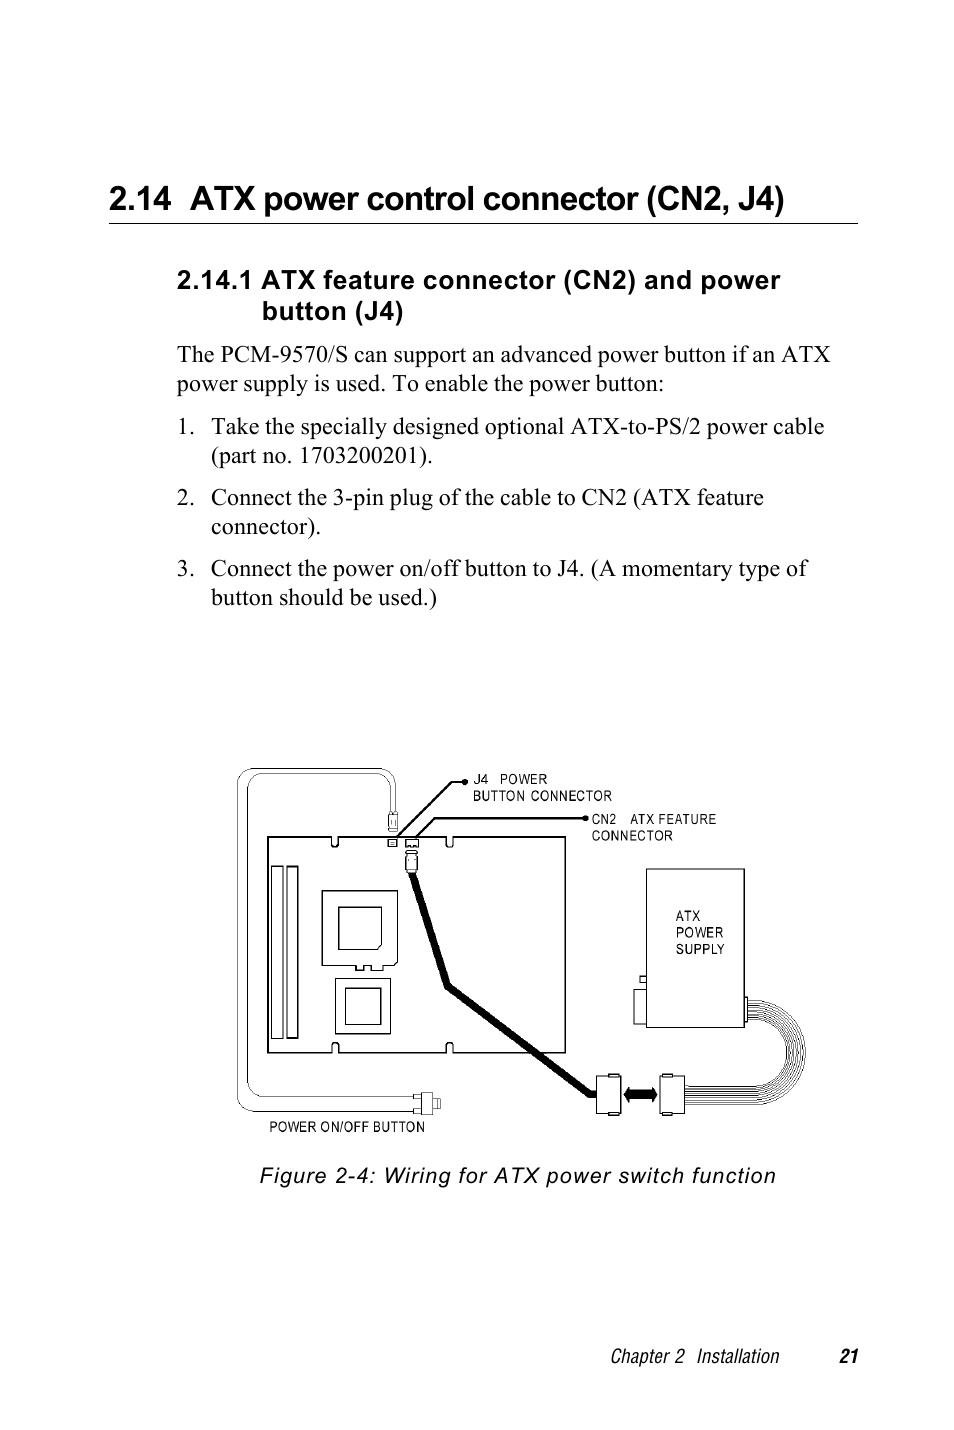 Advantech At Power Supply Pinout Diagram - Wiring Diagram Services •